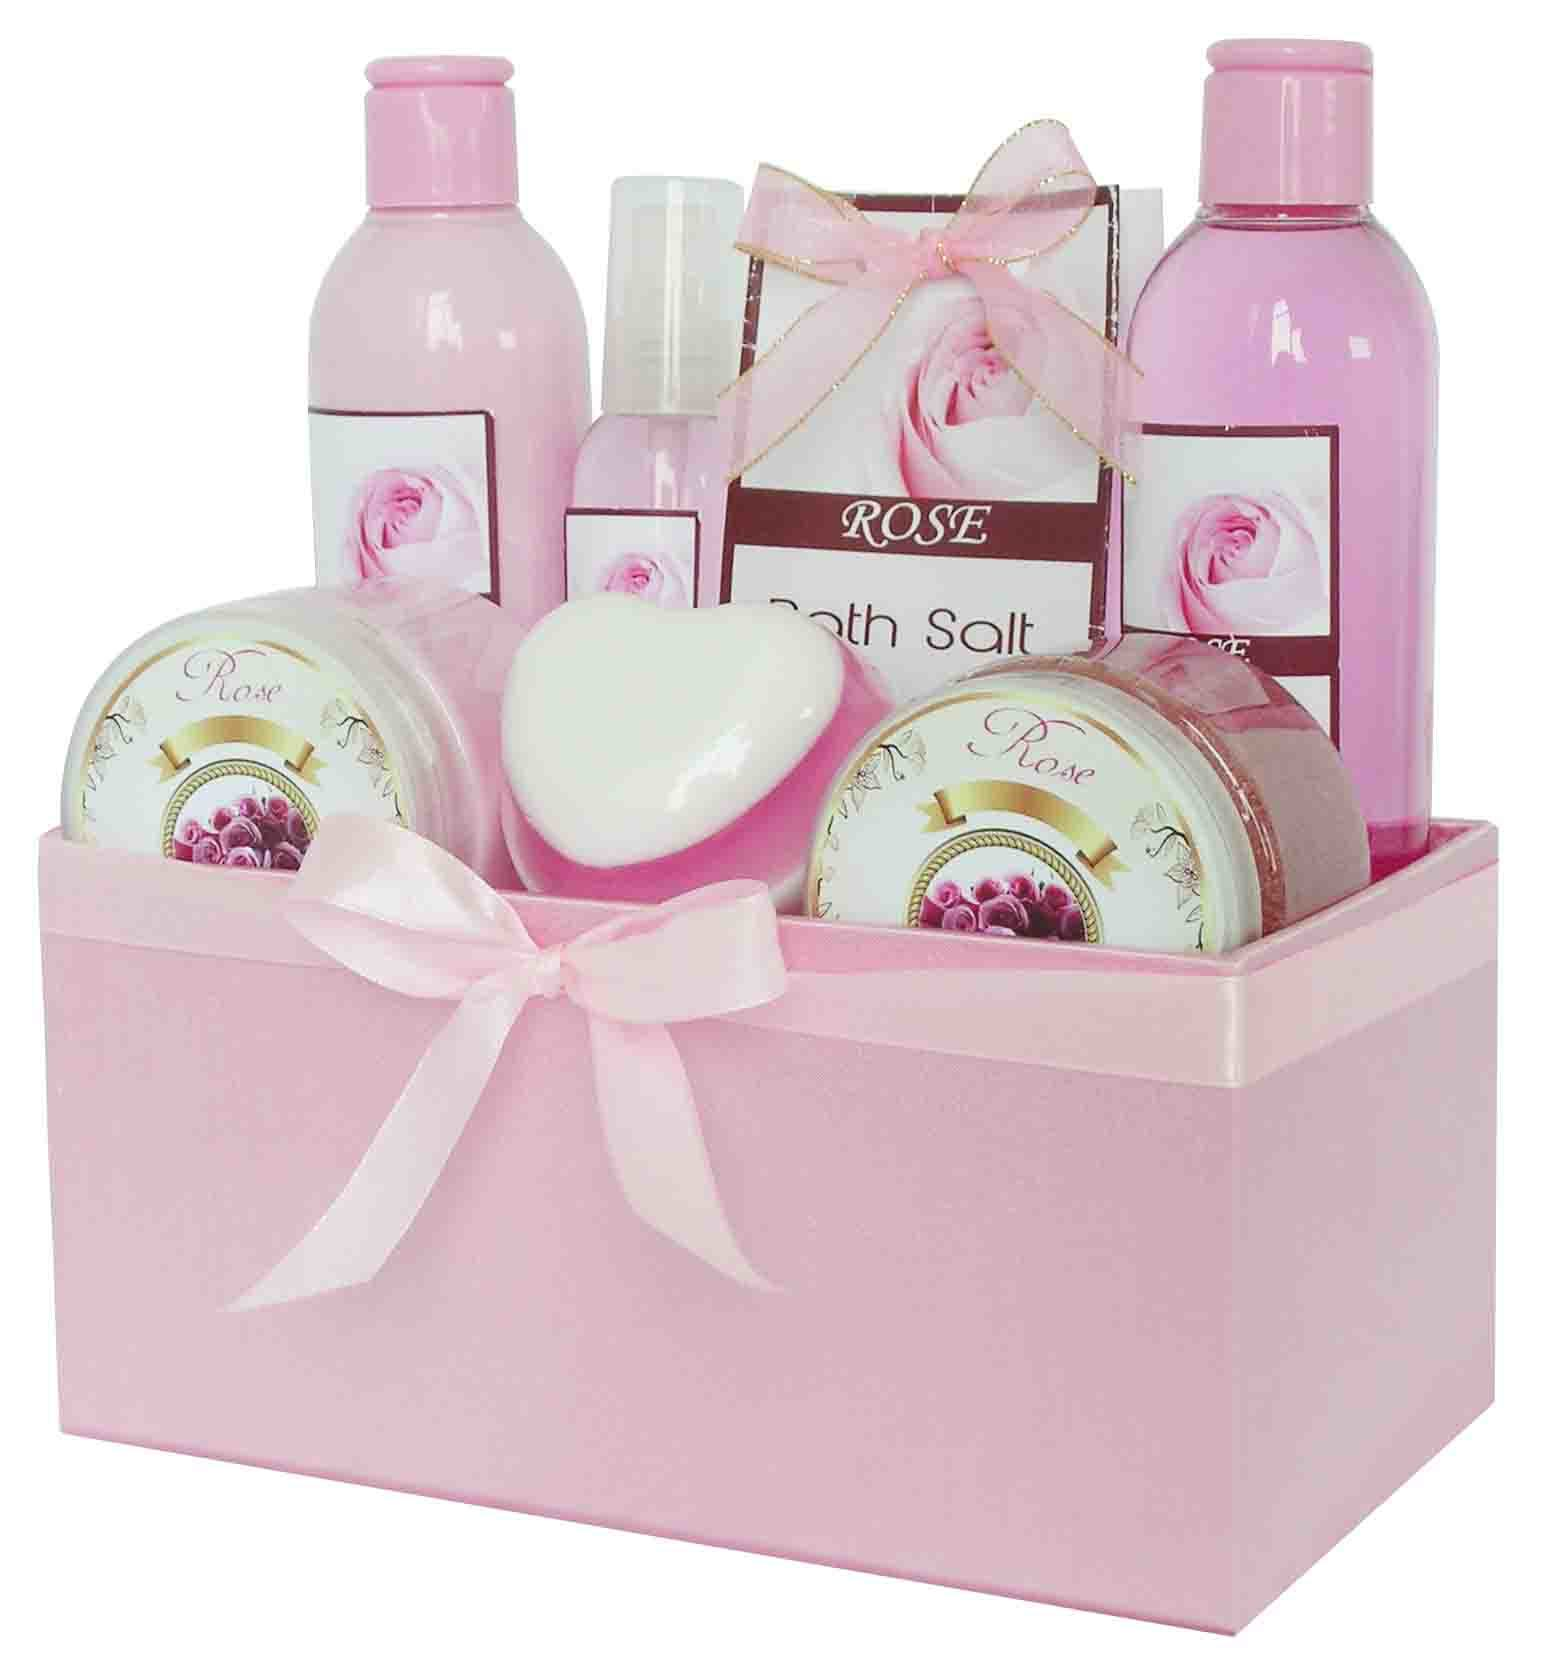 China bath gift sets 2 china bath gift sets spa bath for Bath ensemble sets